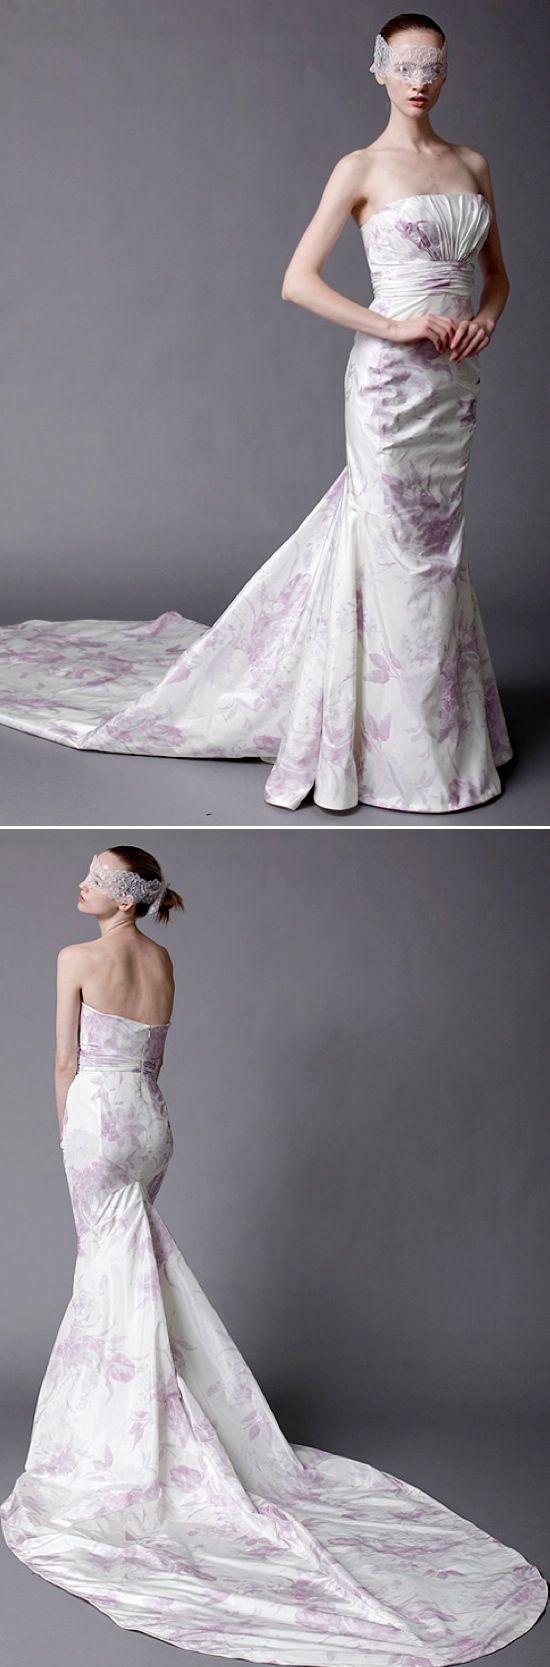 Douglas Hannant 2013 Collection — Wedding Ideas, Wedding Trends, and Wedding Galleries